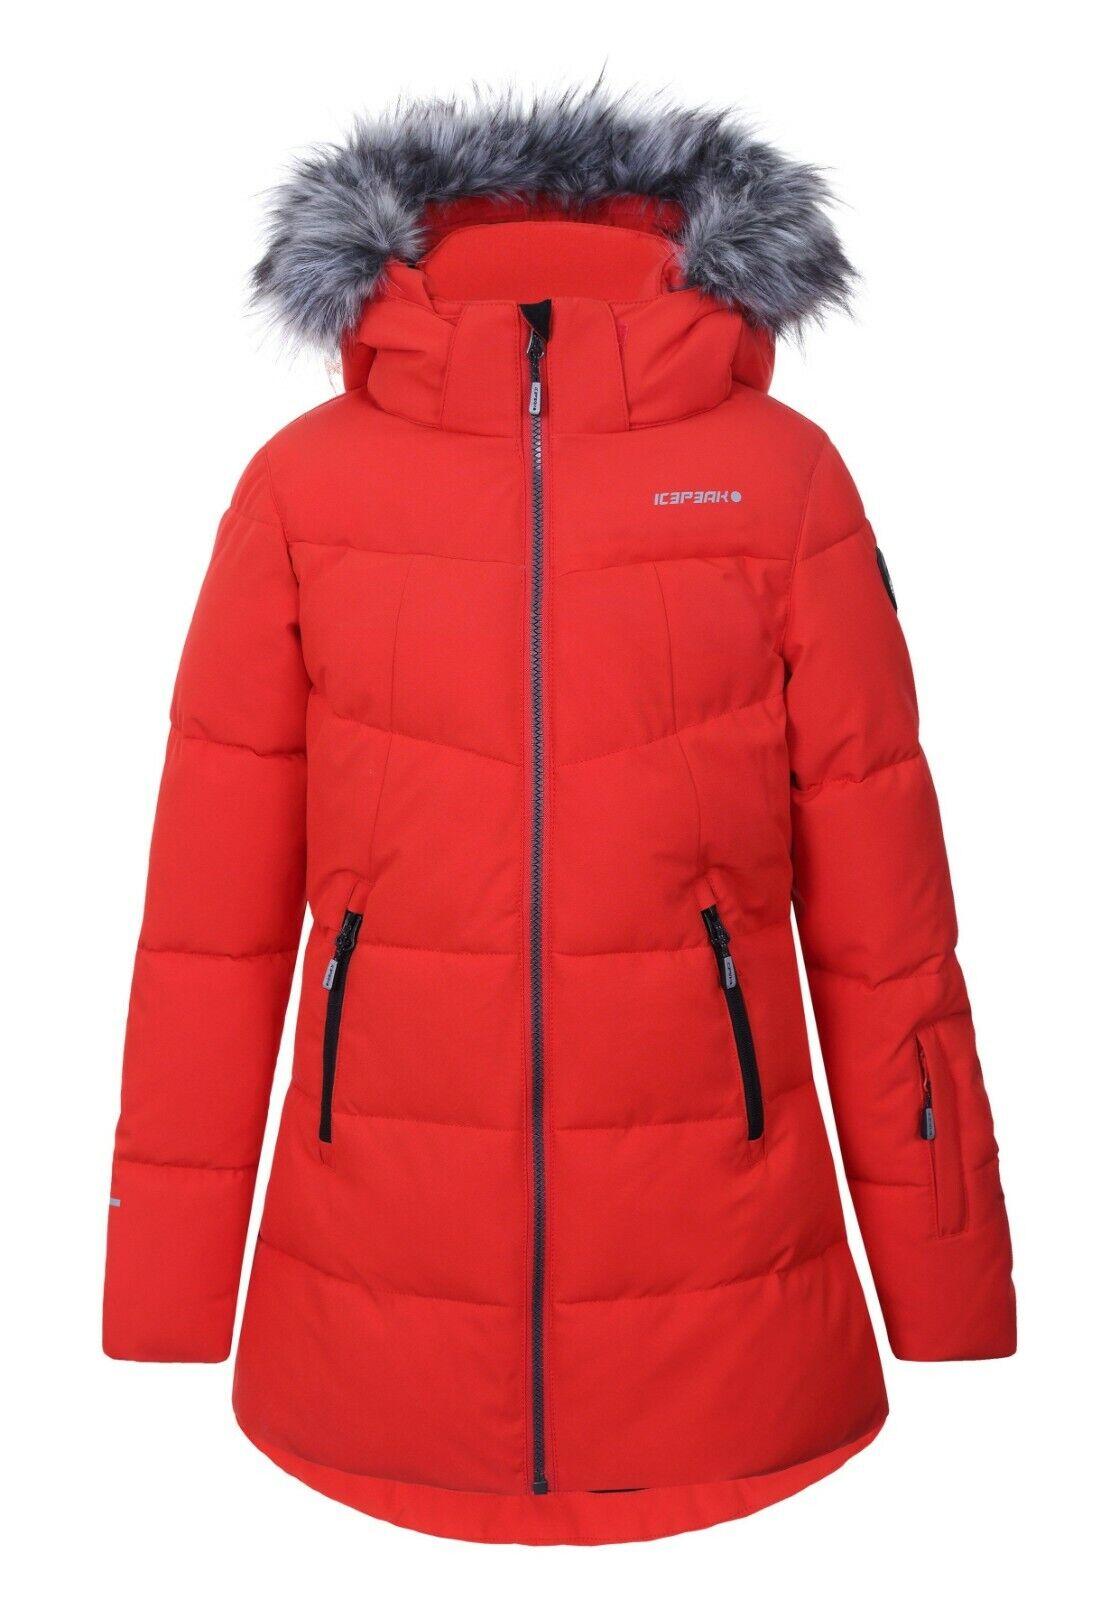 Icepeak Leona Jr. Skijacke Mantel Kinder Schneefang abnehmbare Kapuze  149,95